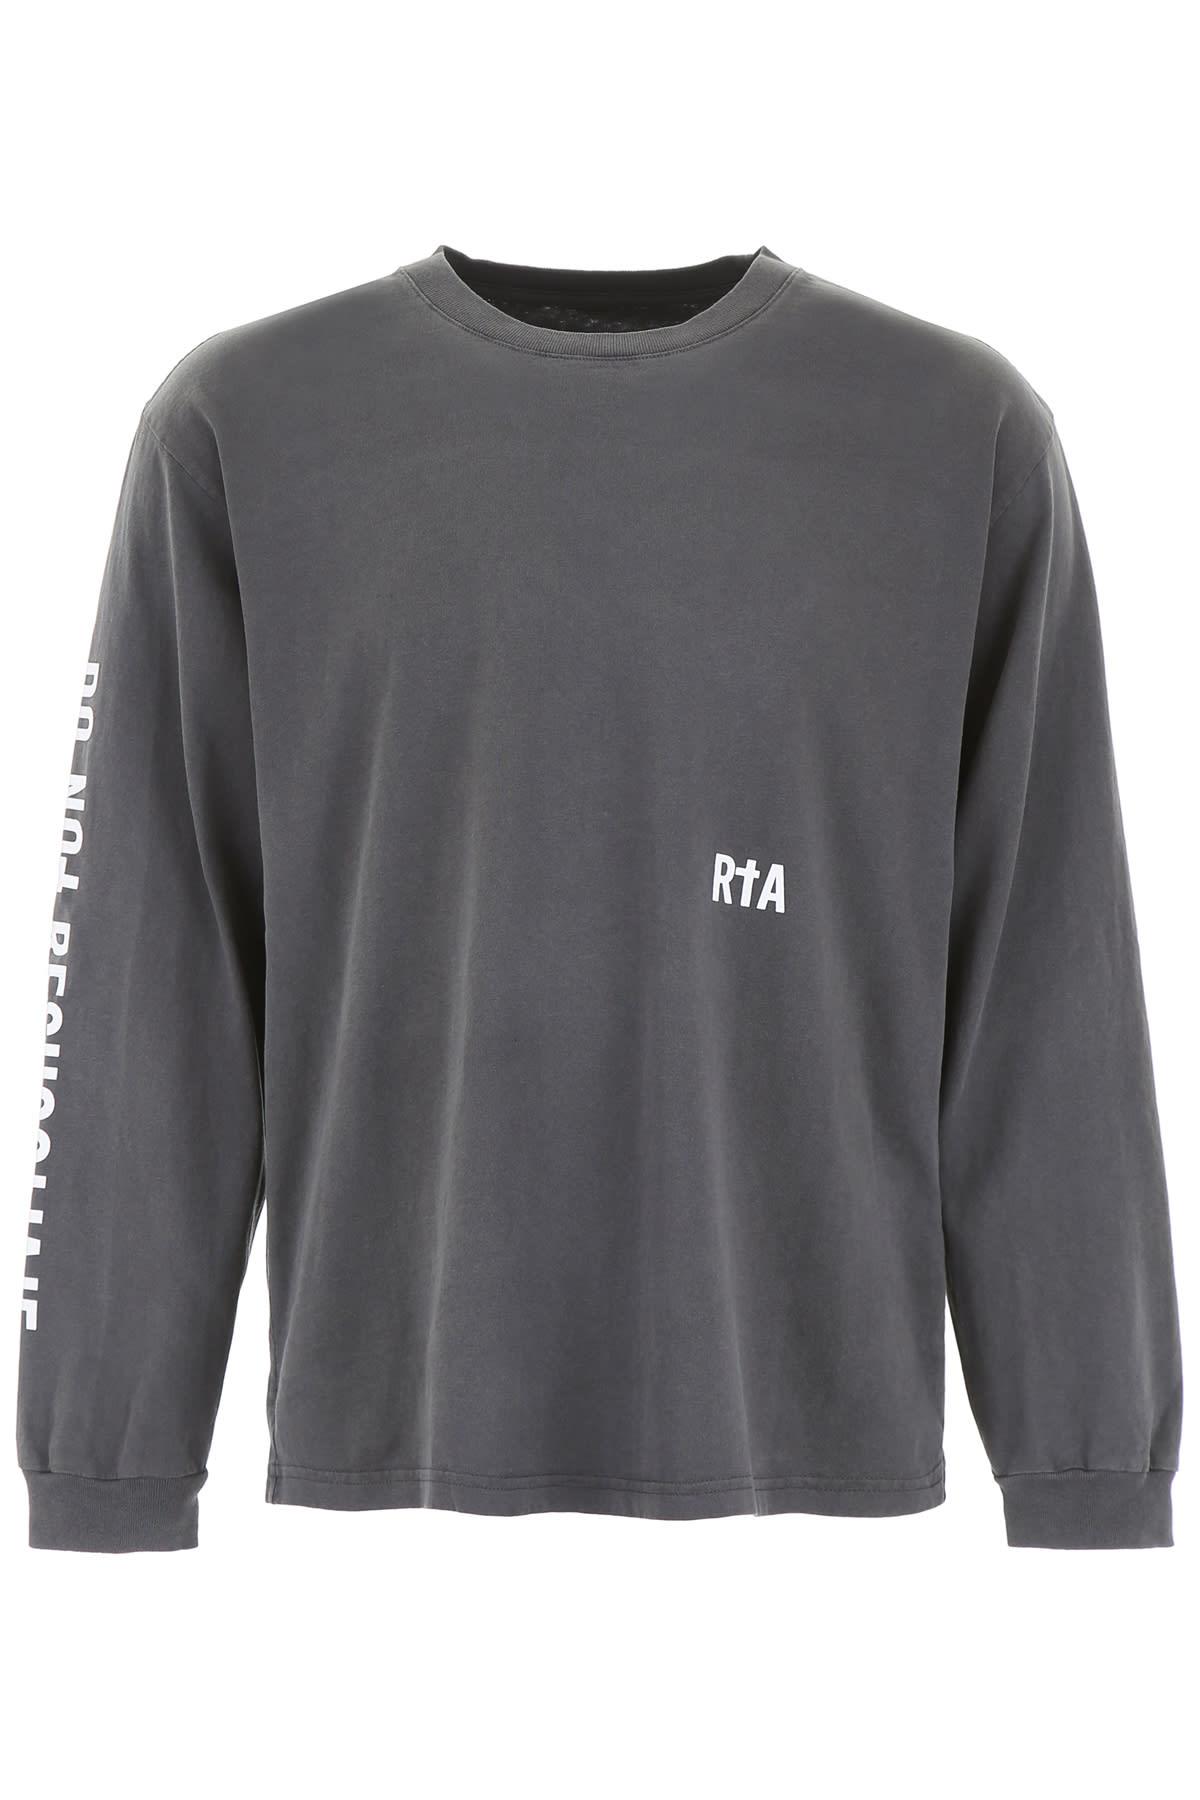 RTA Organ Donor T-shirt